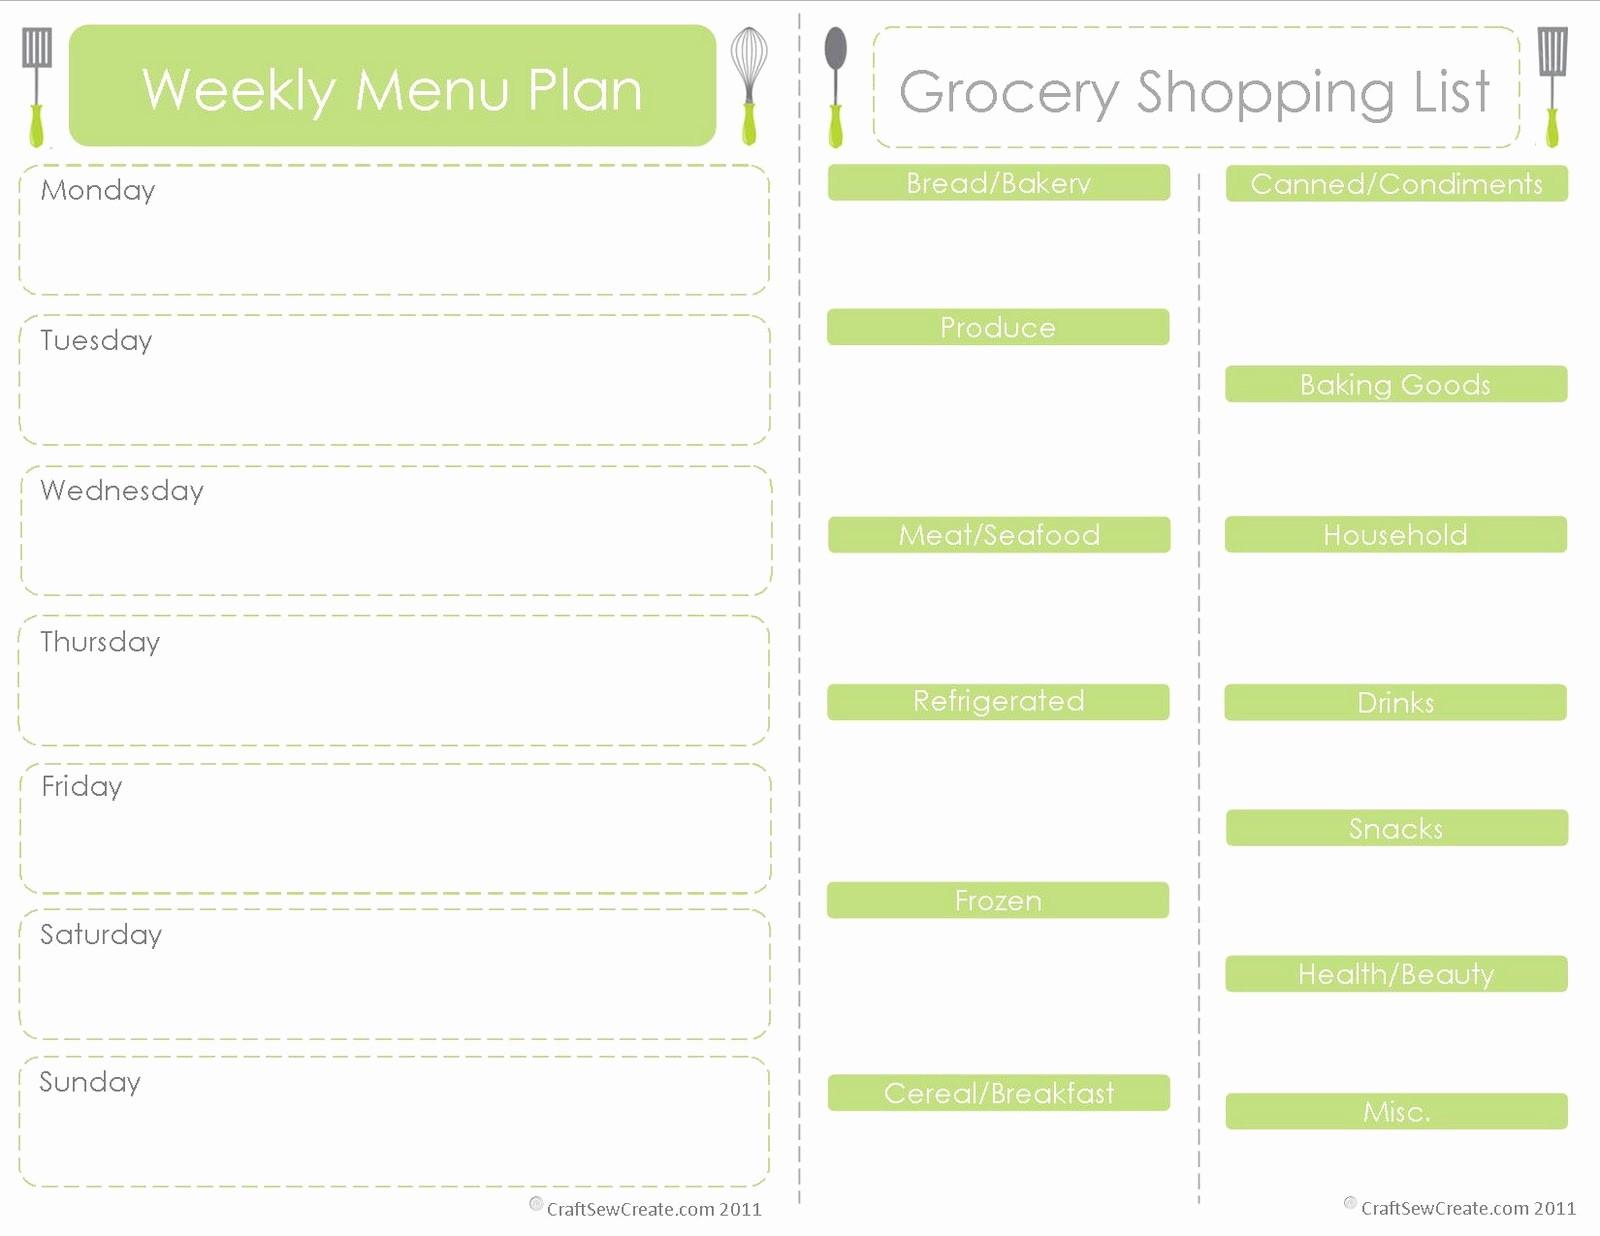 Free Meal Planner Template Download Elegant Craft Sew Create Free Printable Menu Plan Shopping List